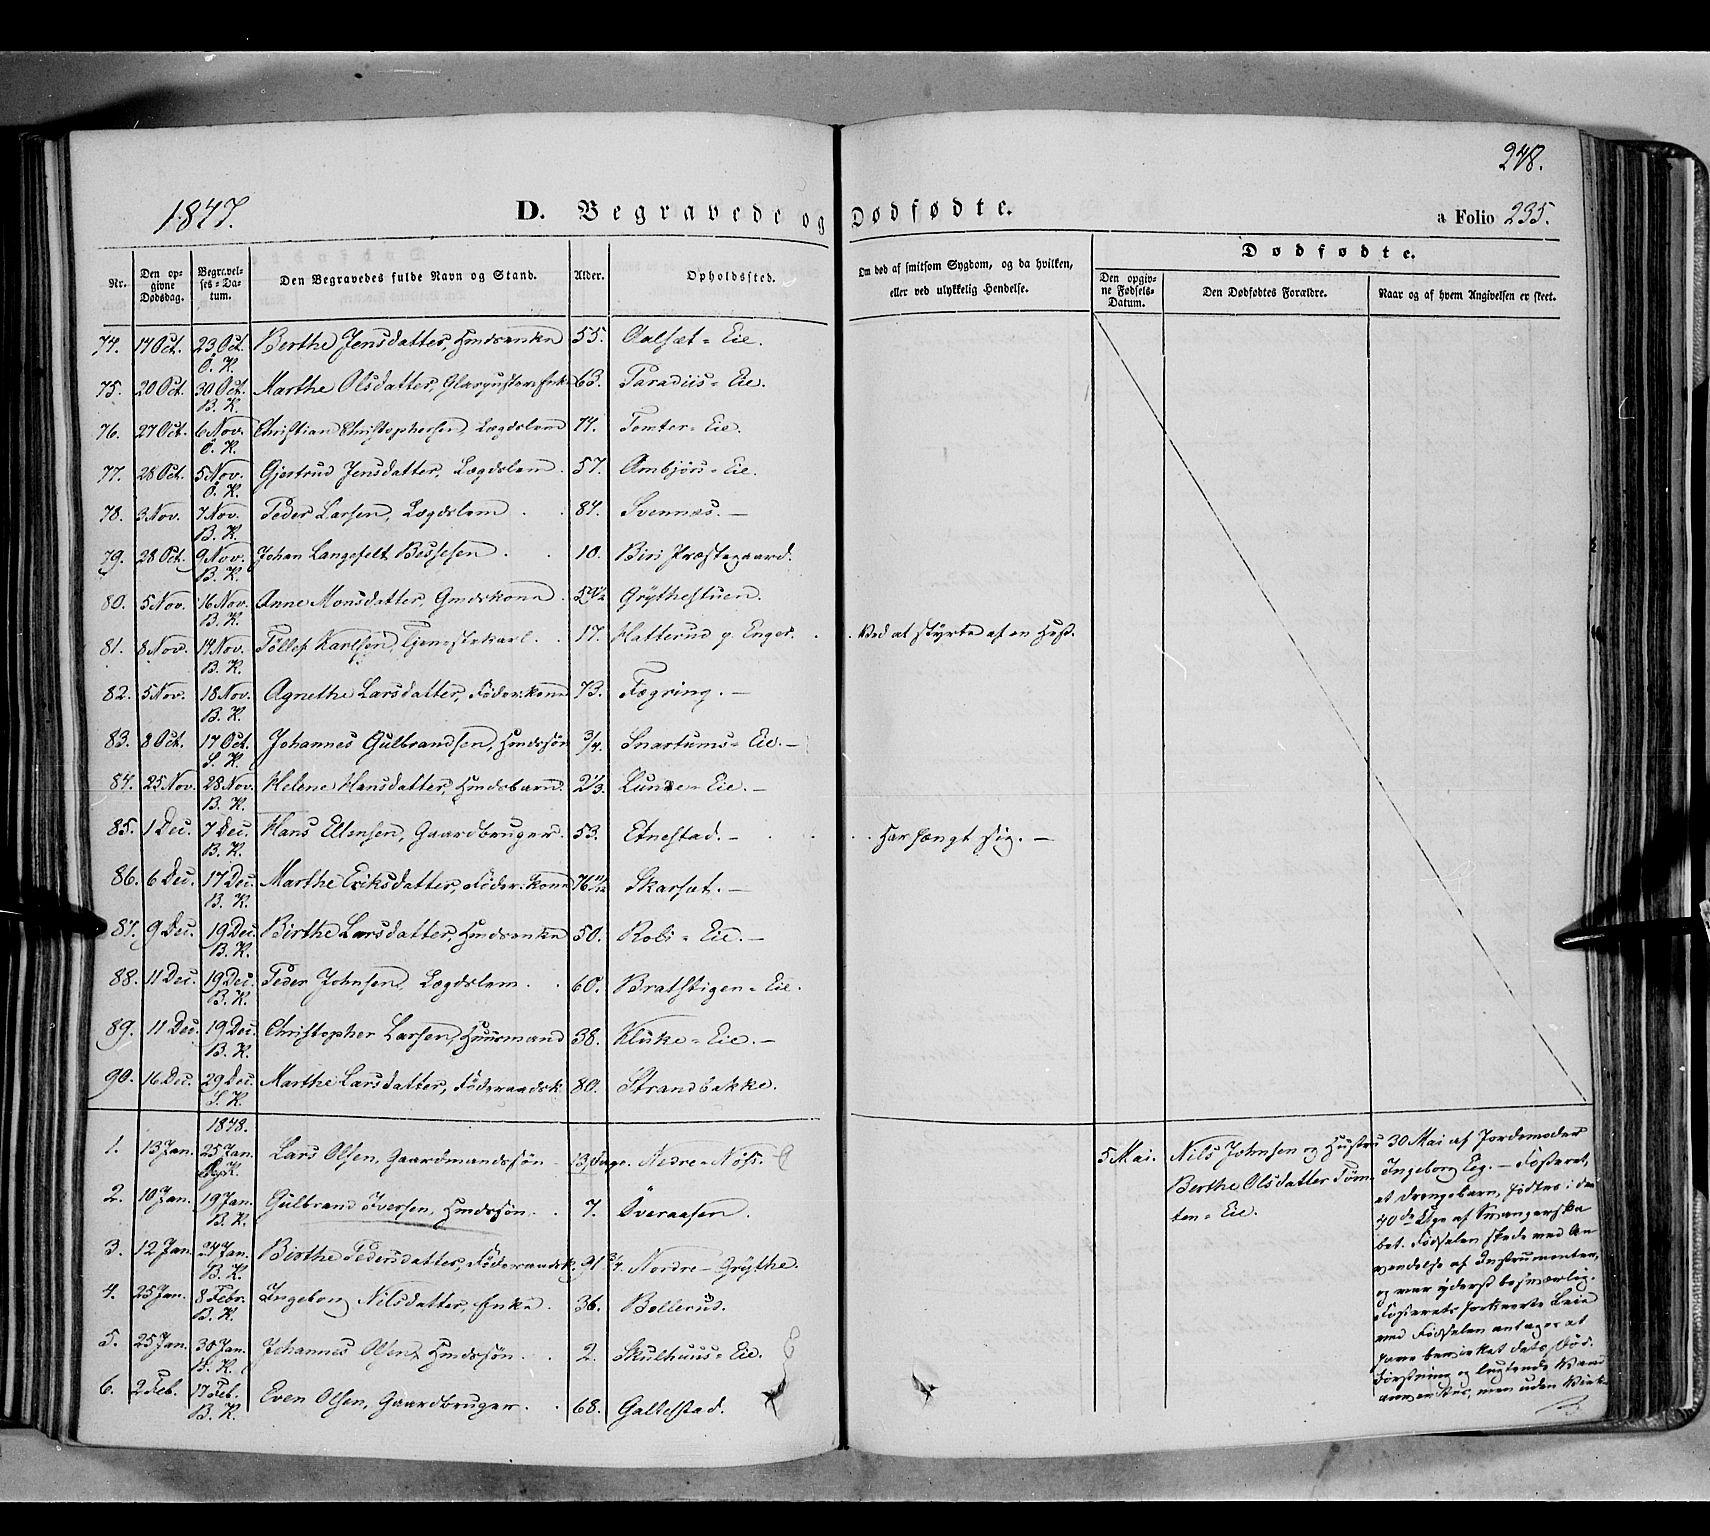 SAH, Biri prestekontor, Ministerialbok nr. 5, 1843-1854, s. 248